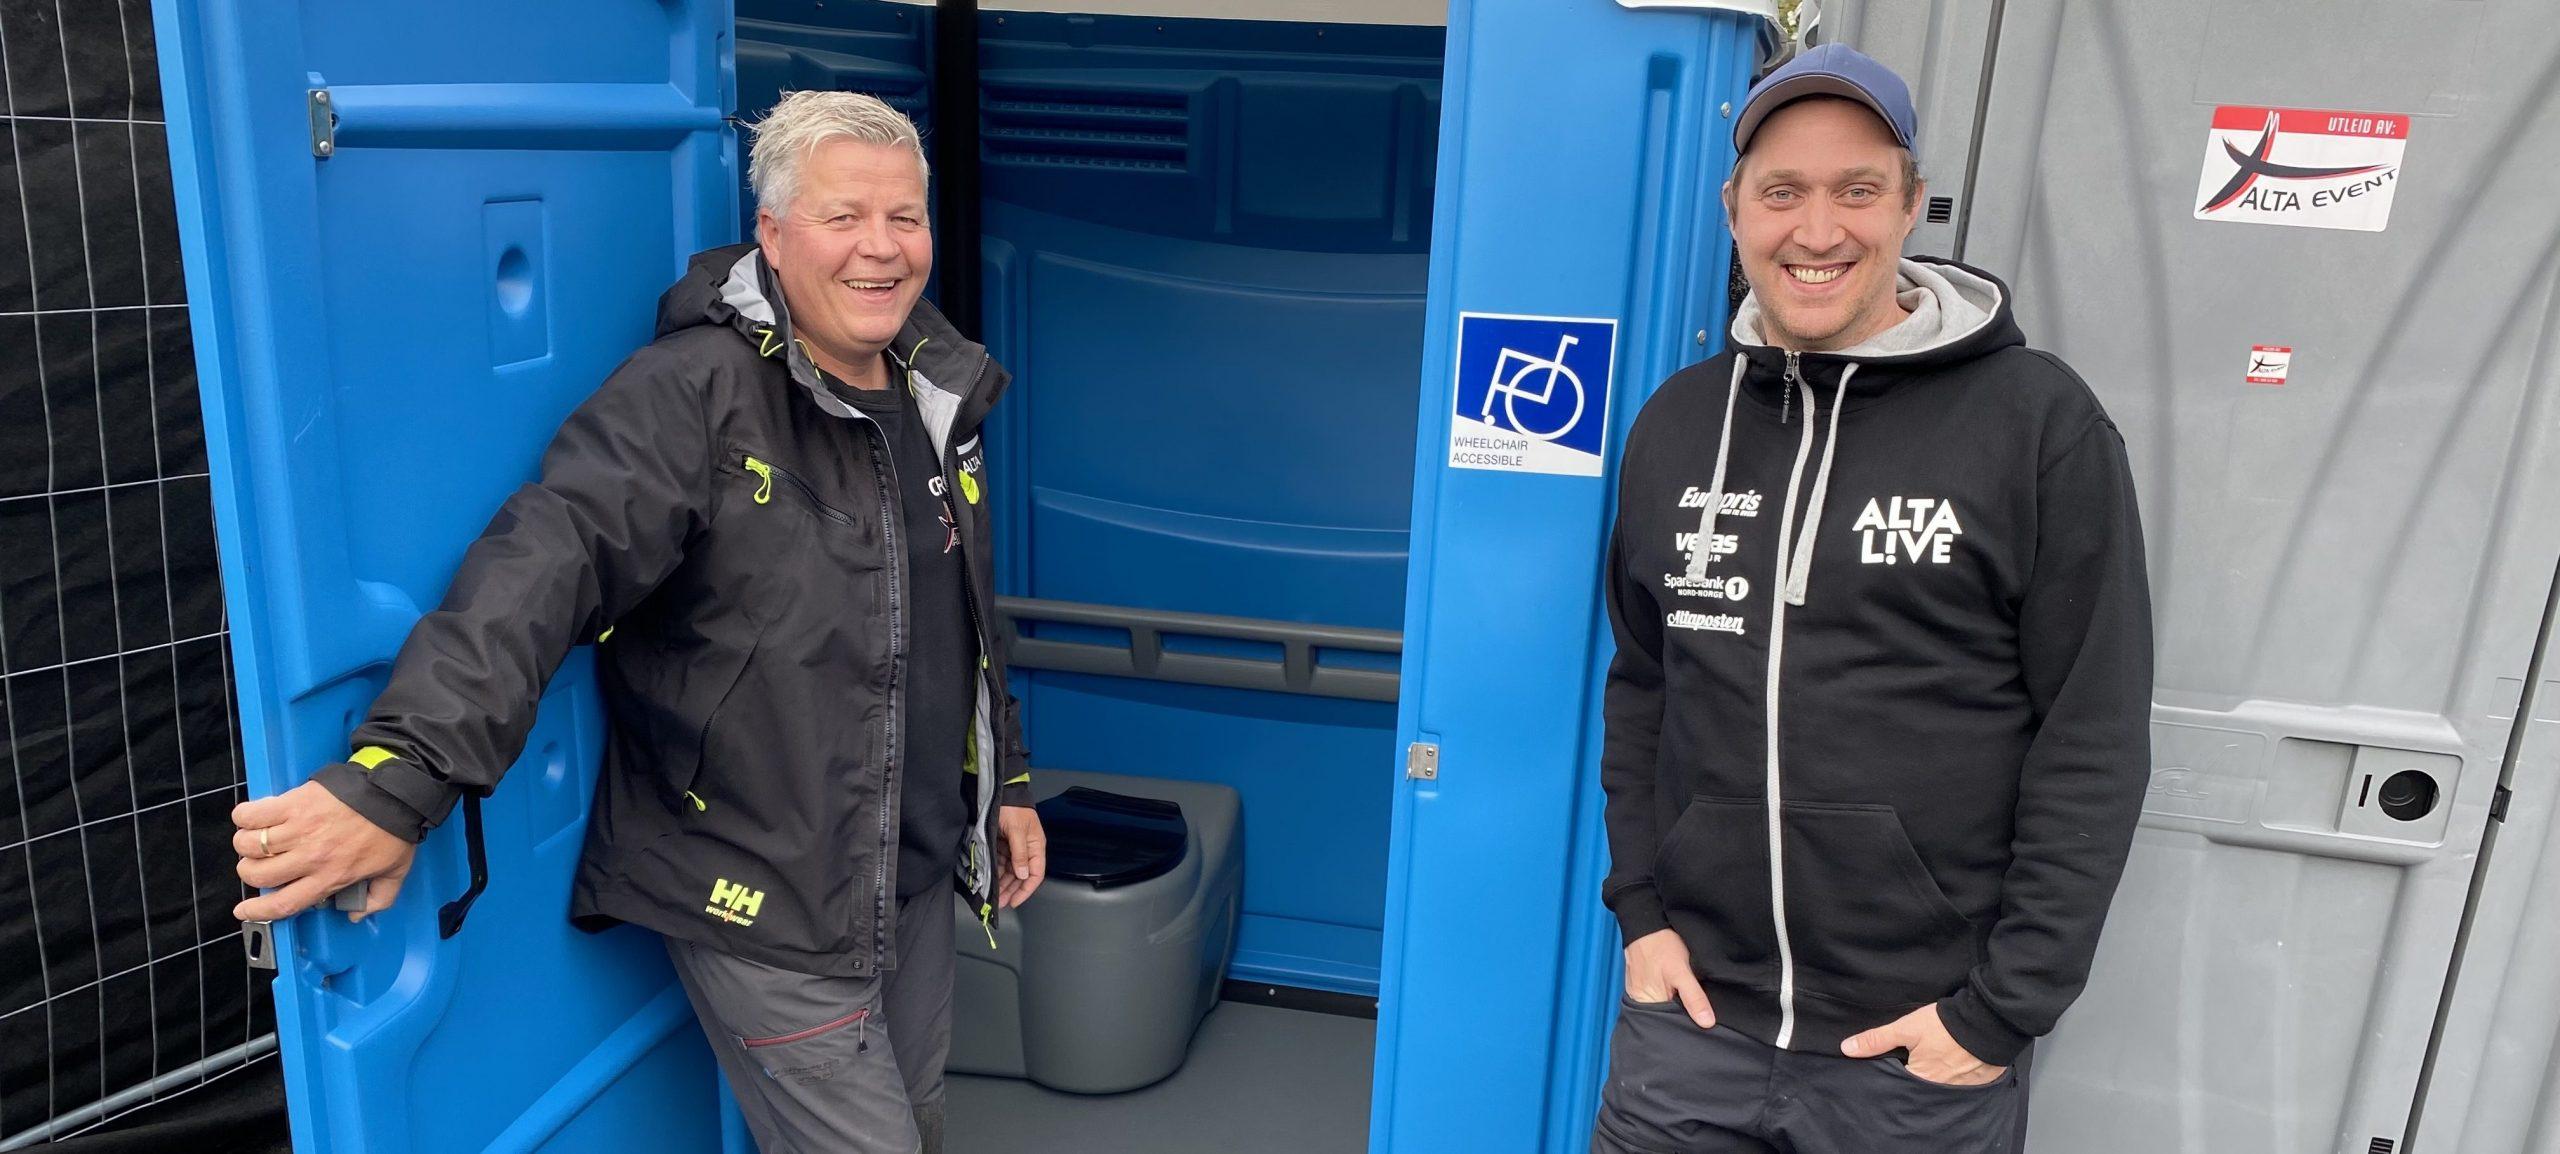 Bildet viser Festivalsjef Torgeir Ekeland og Stig Anton Eliassen i Alta Event som poserer foran det nye portable handicaptoalettet.